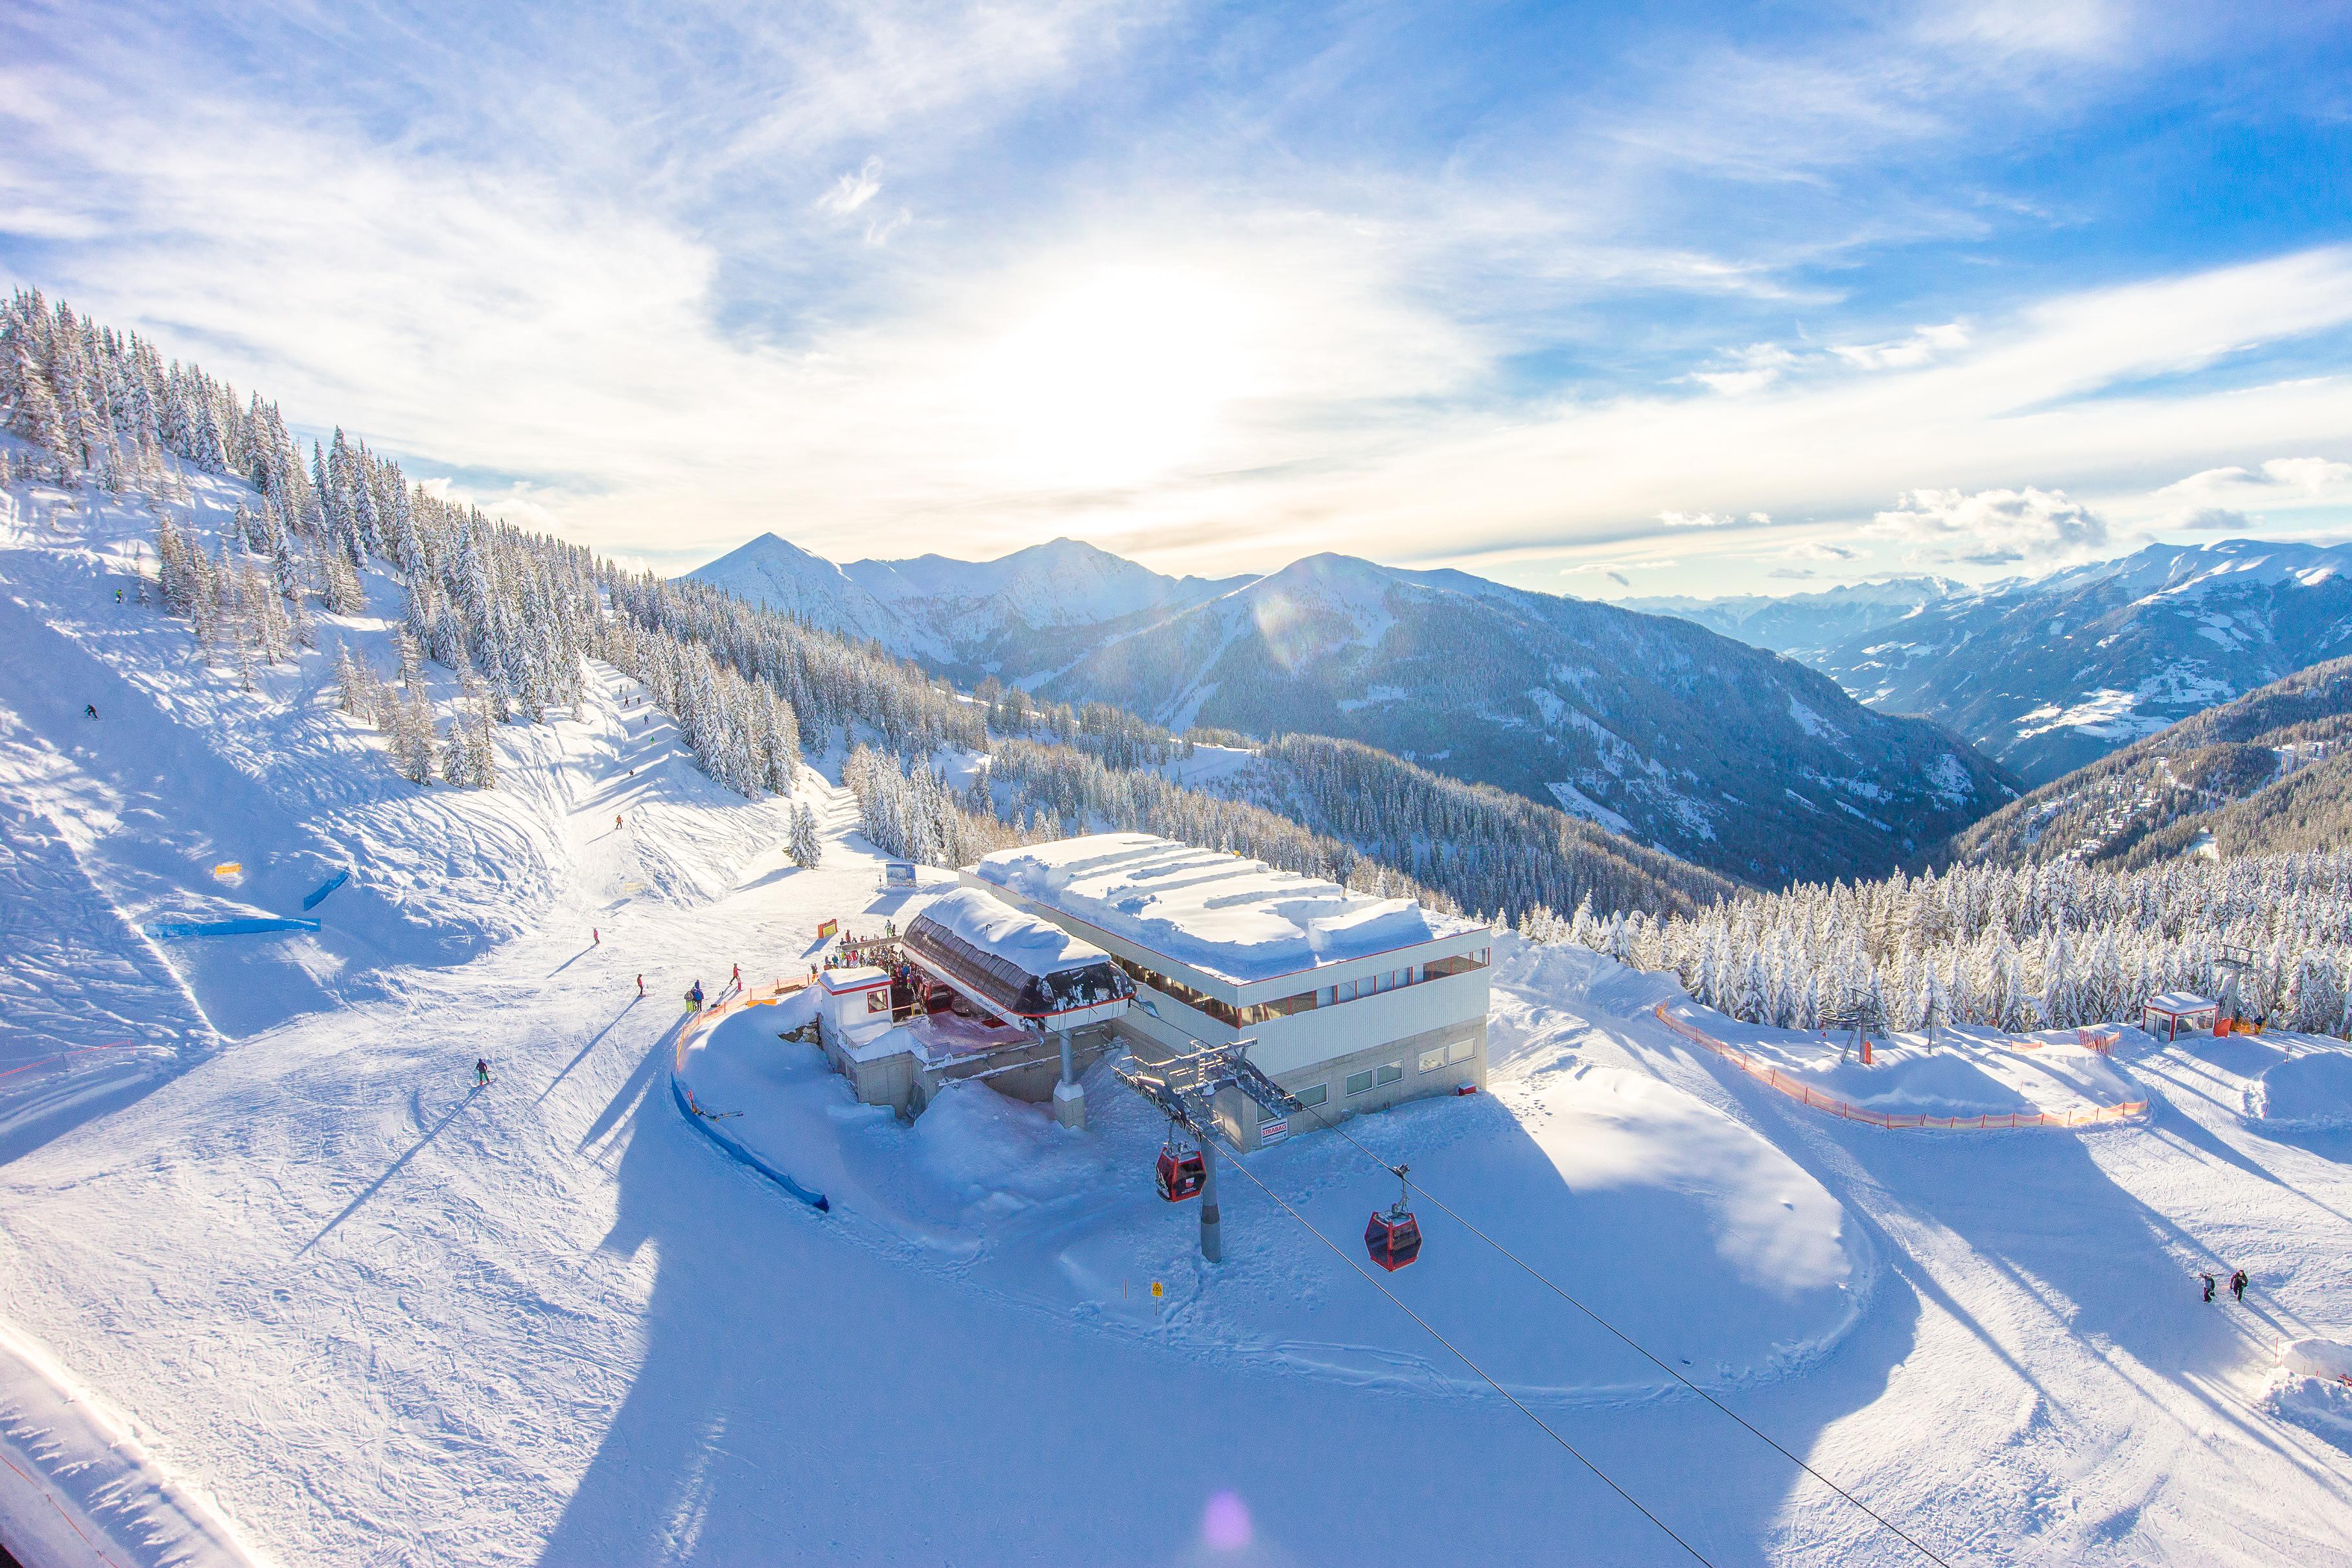 goldeck perfektes skiwetter